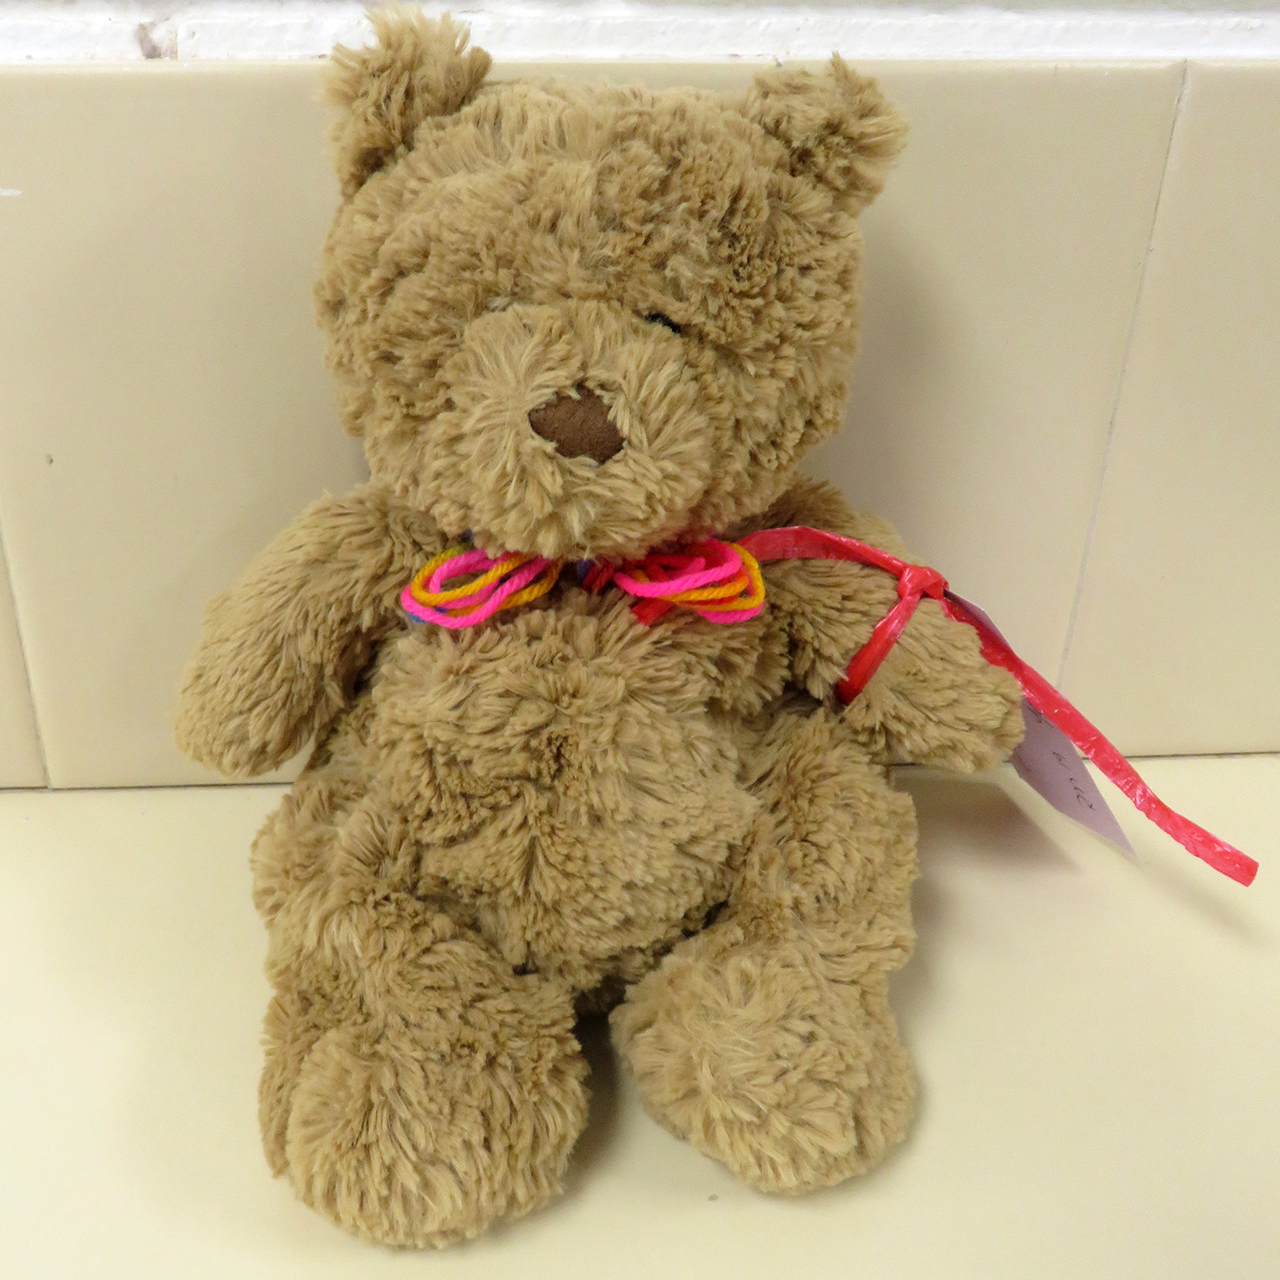 Star Bear - George Byrne-Colclough